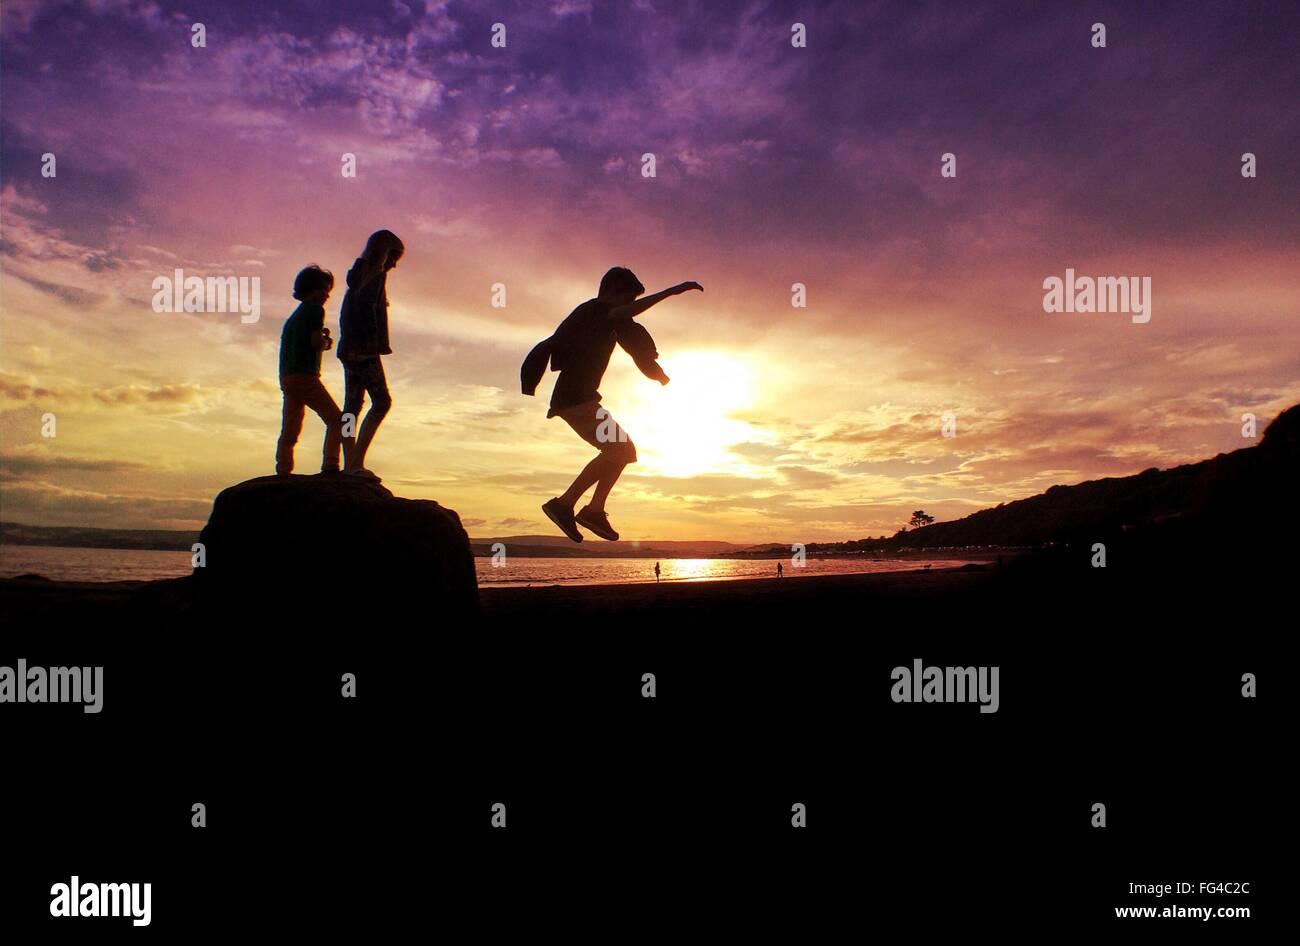 Silhouette Friends Enjoying On Beach Against Orange Sky - Stock Image